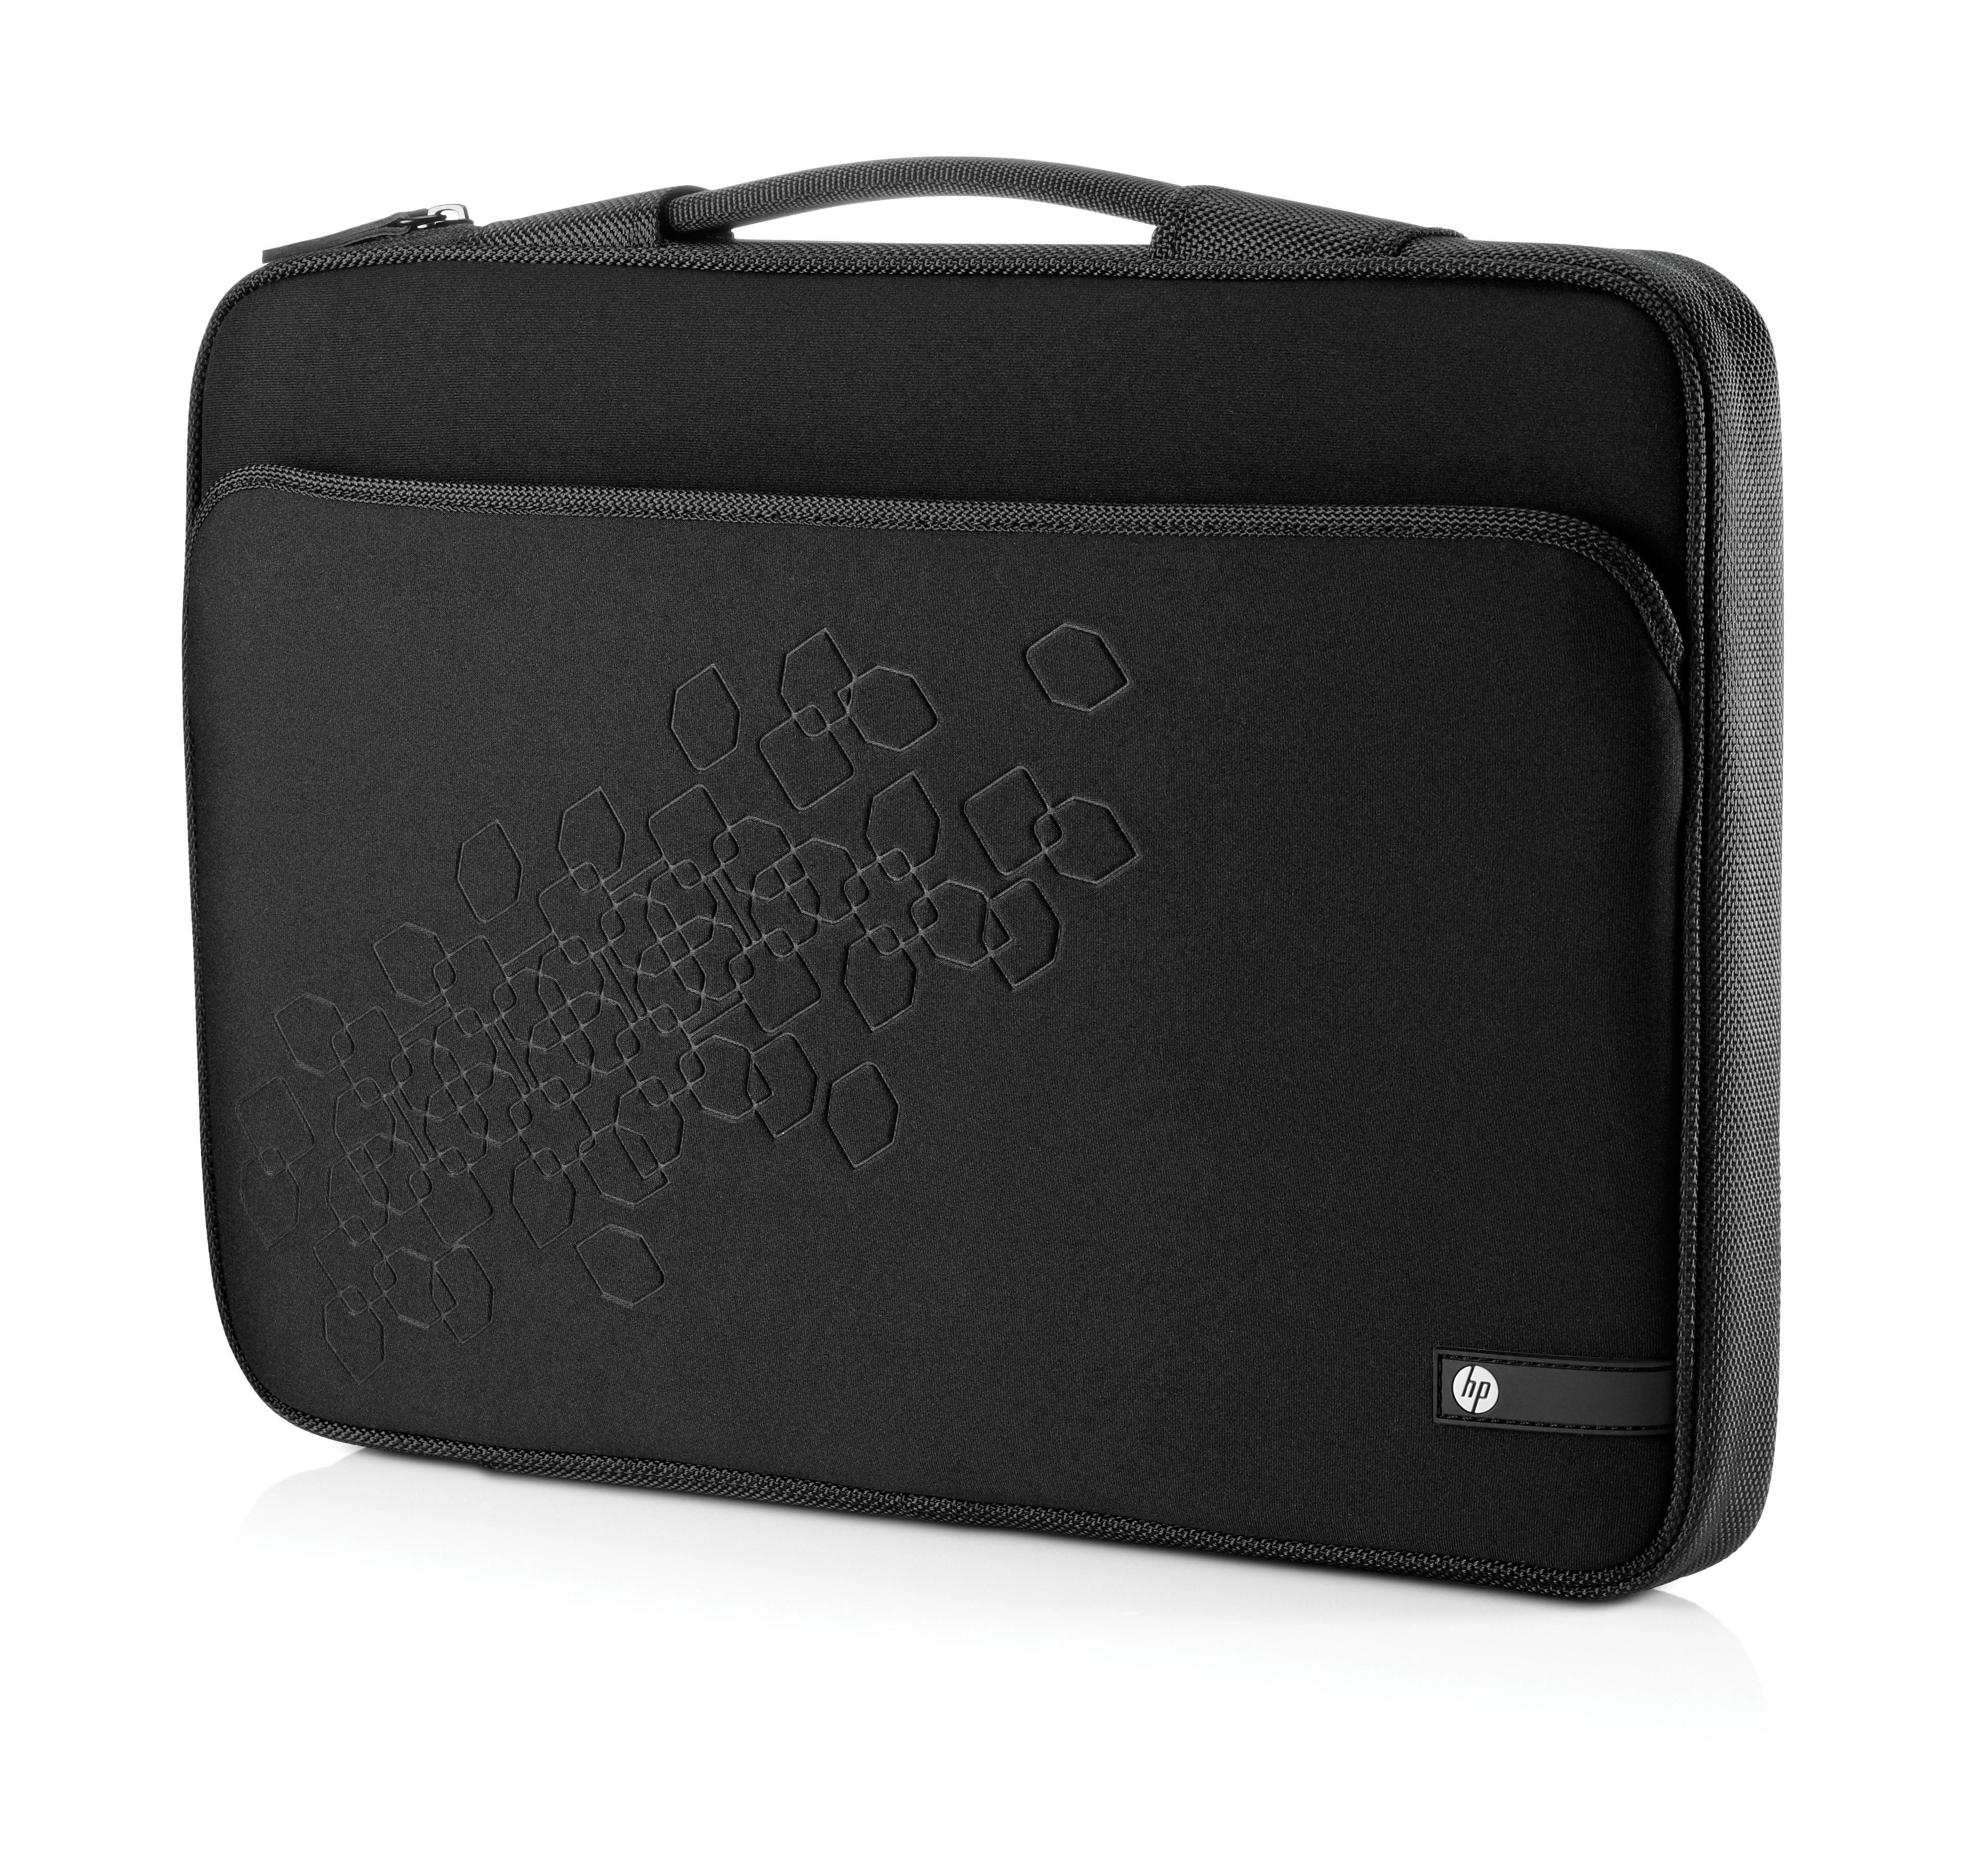 HP 16 Zoll Notebook-Hülle (Black Cherry)